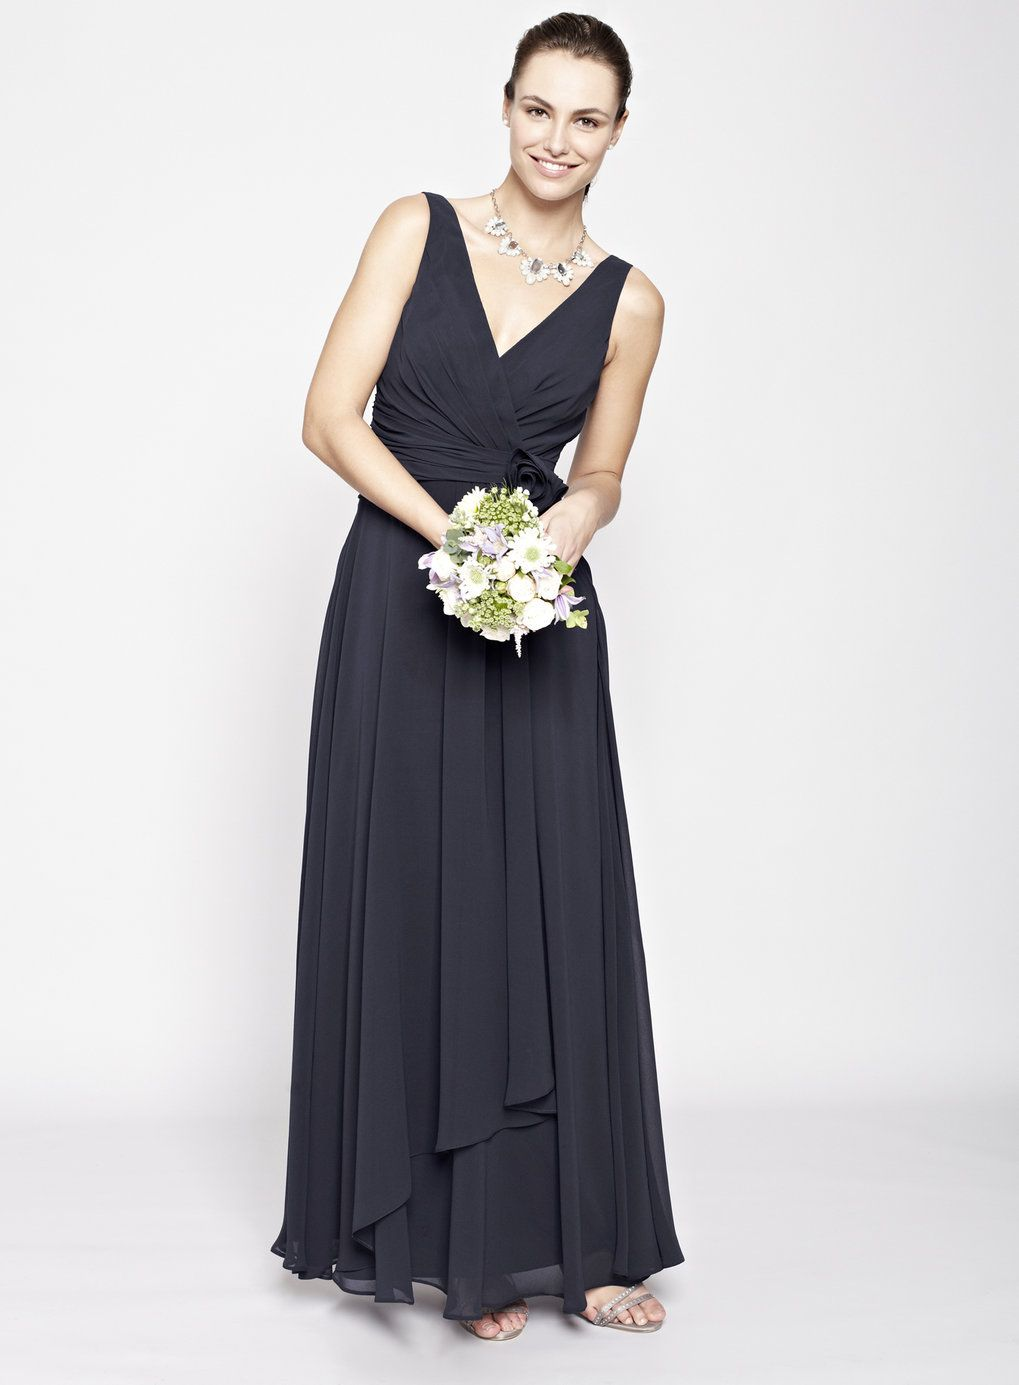 Navy amber long bridesmaid dress httpweddingheartbhs navy amber long bridesmaid dress httpweddingheart ombrellifo Gallery